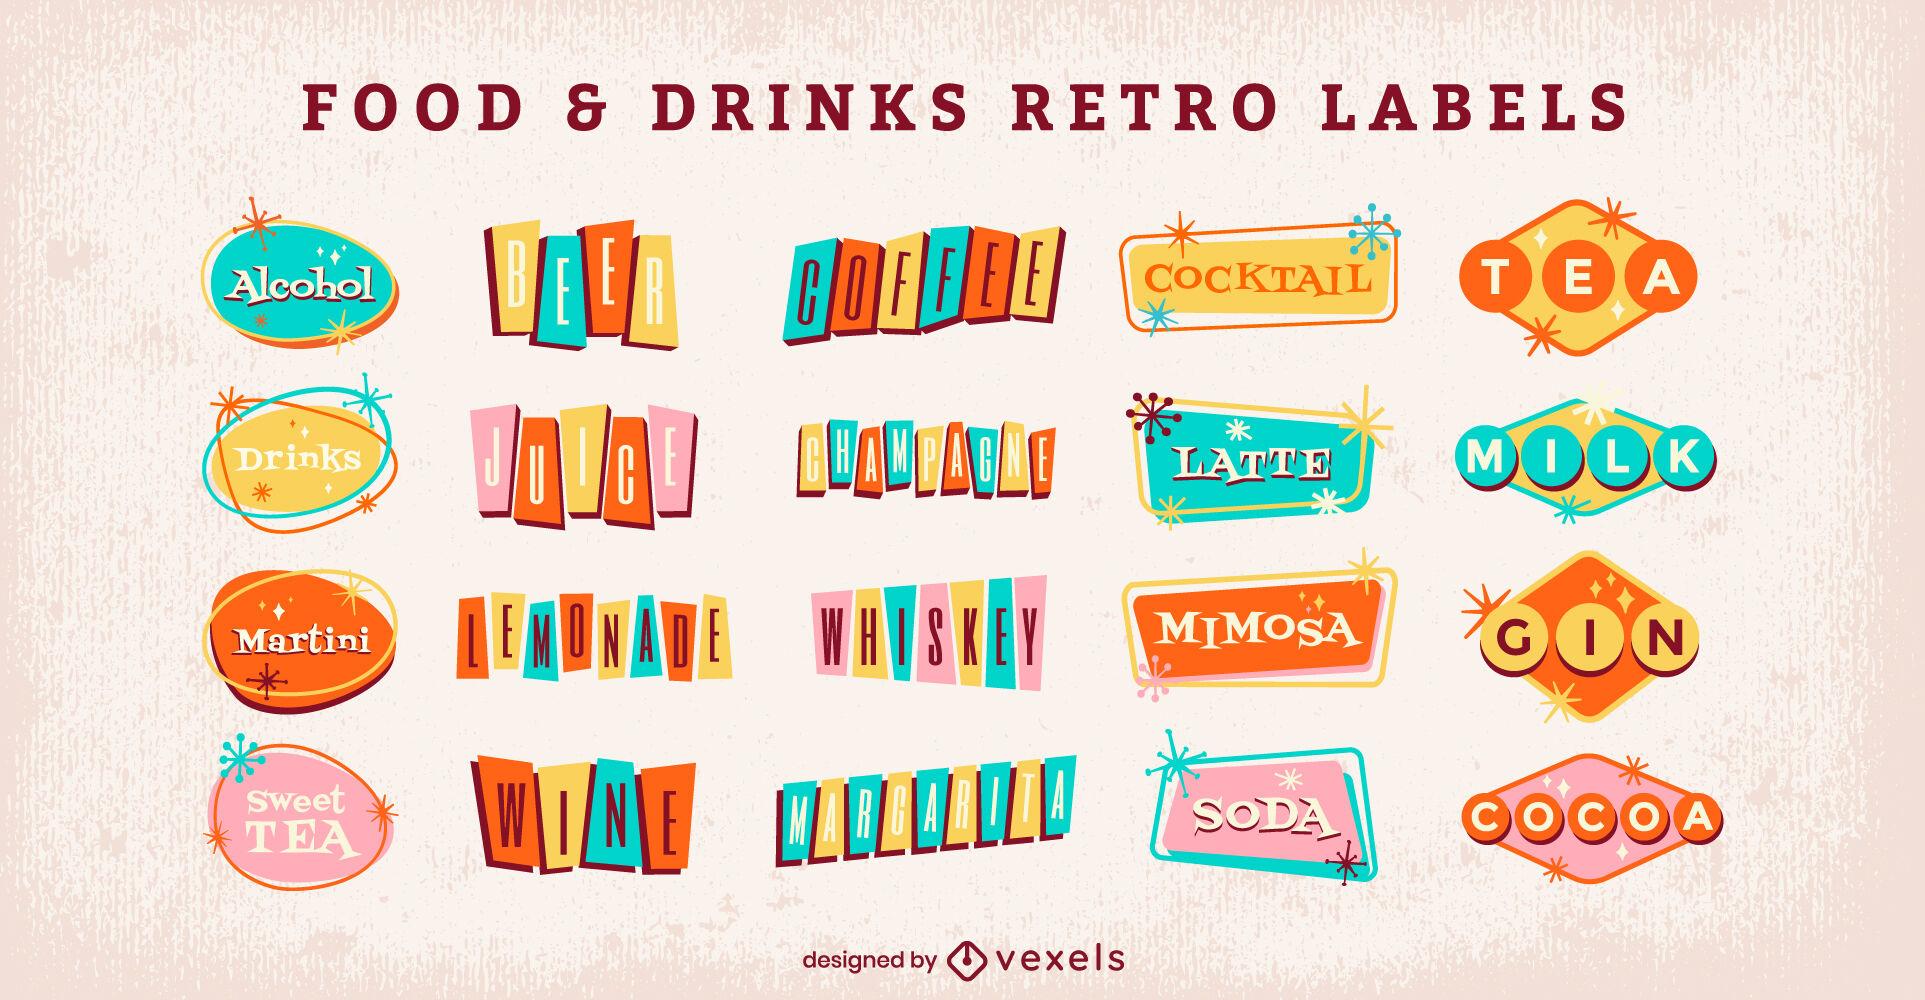 Alcoholic drinks 60s retro label set